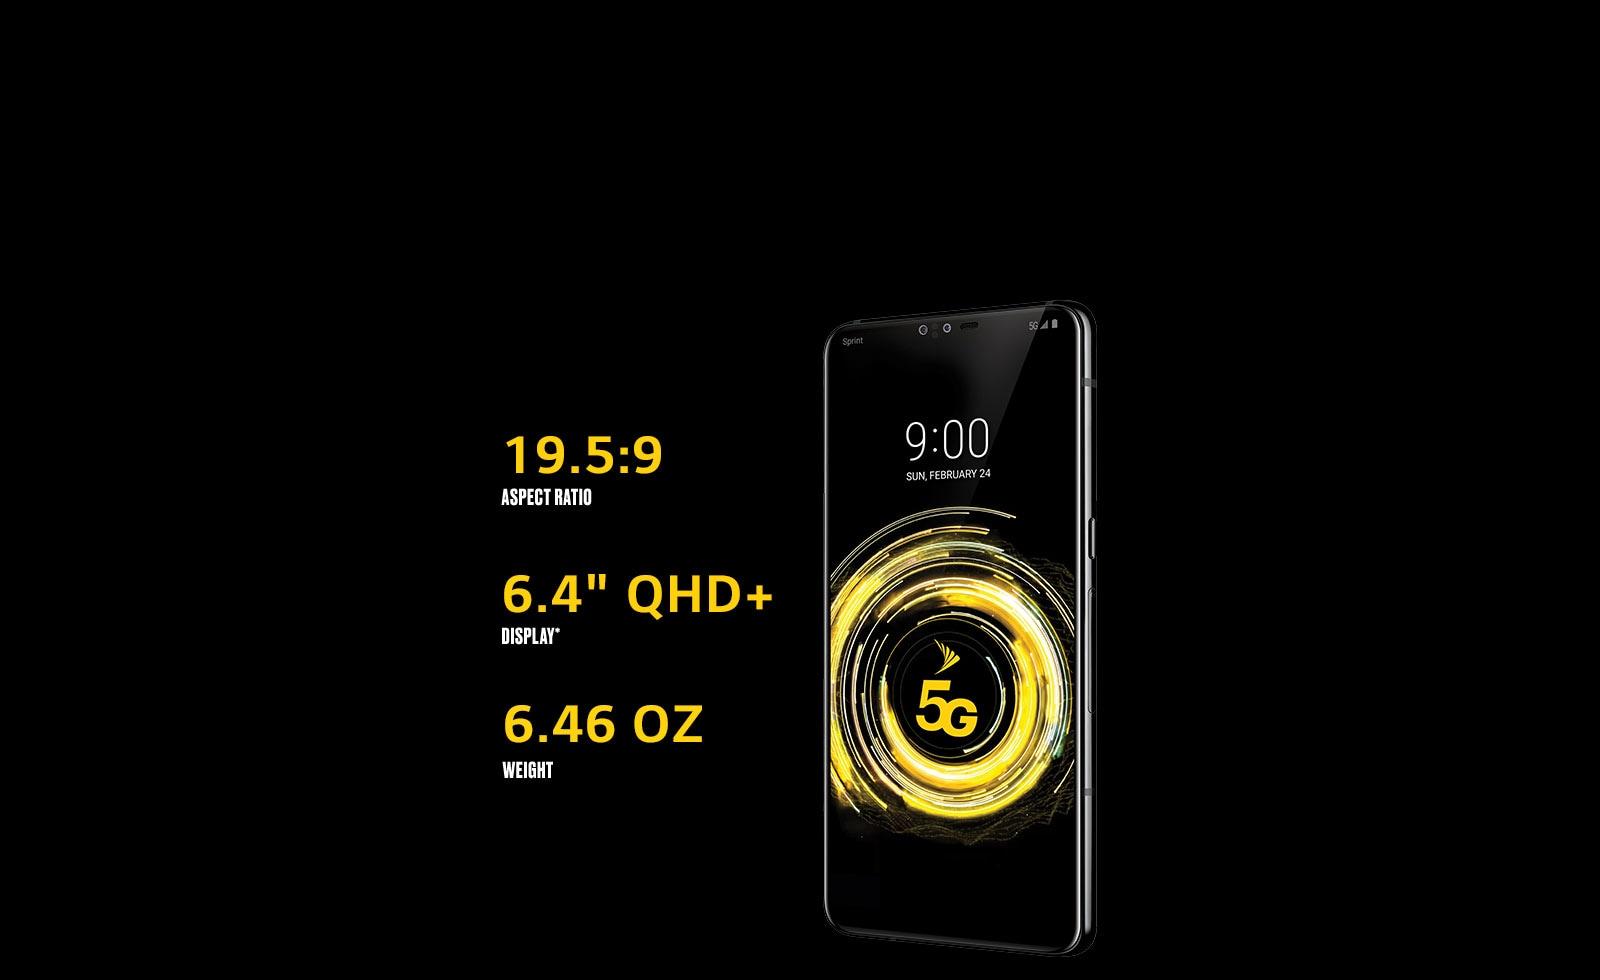 "The LG V50 ThinQ 5G. 19.5:9 aspect ratio. 6.4"" QHD+ display. 6.46 Oz weight."